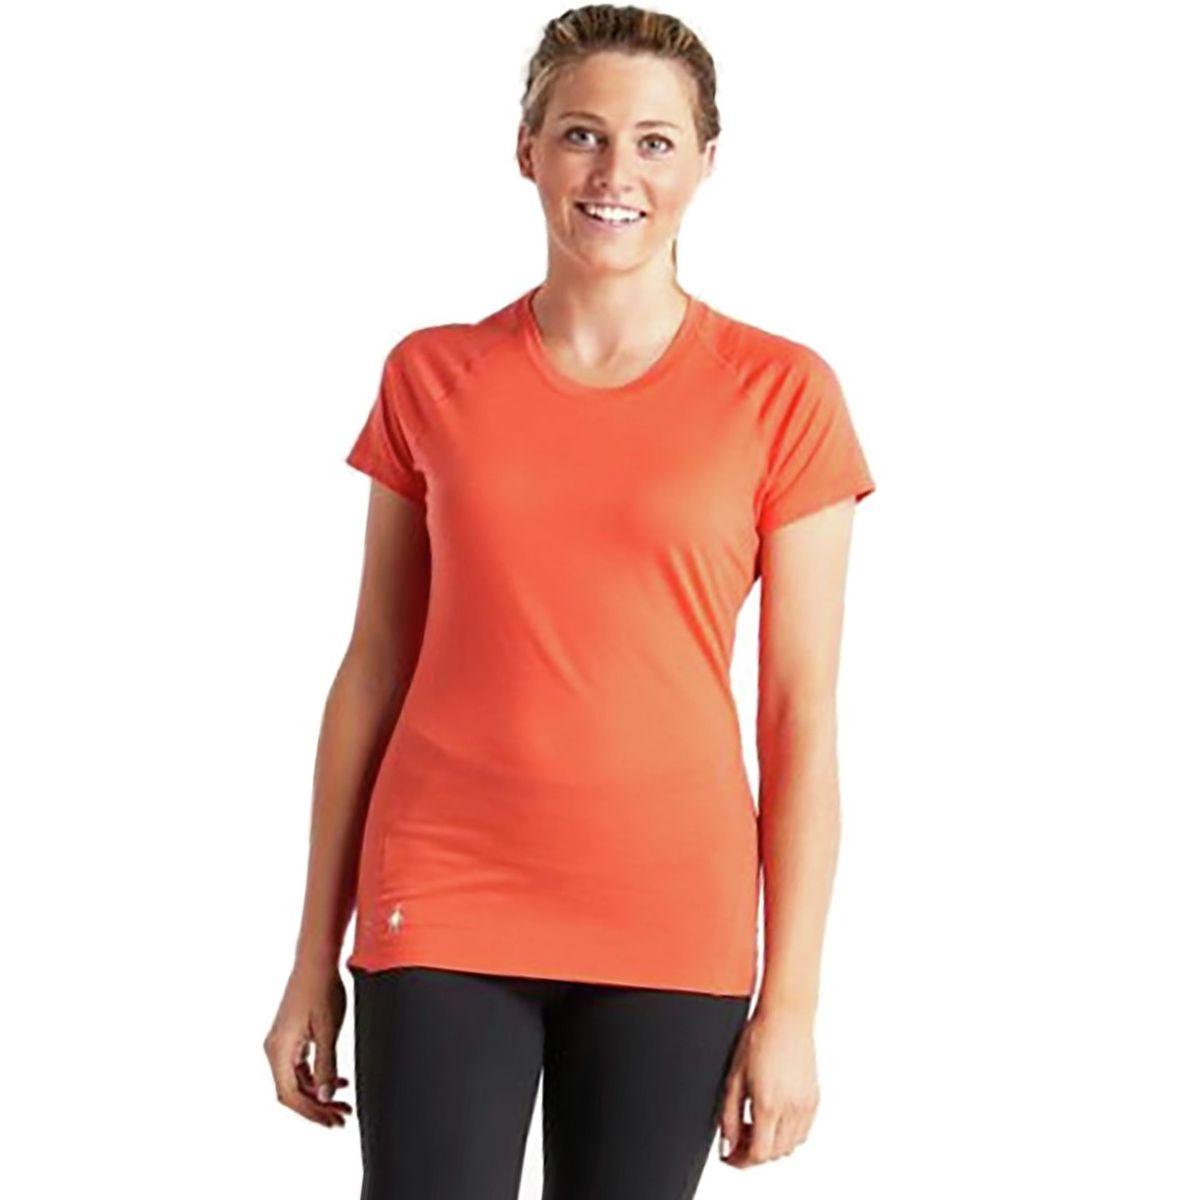 Smartwool Merino 150 Short-Sleeve Baselayer Top - Women's